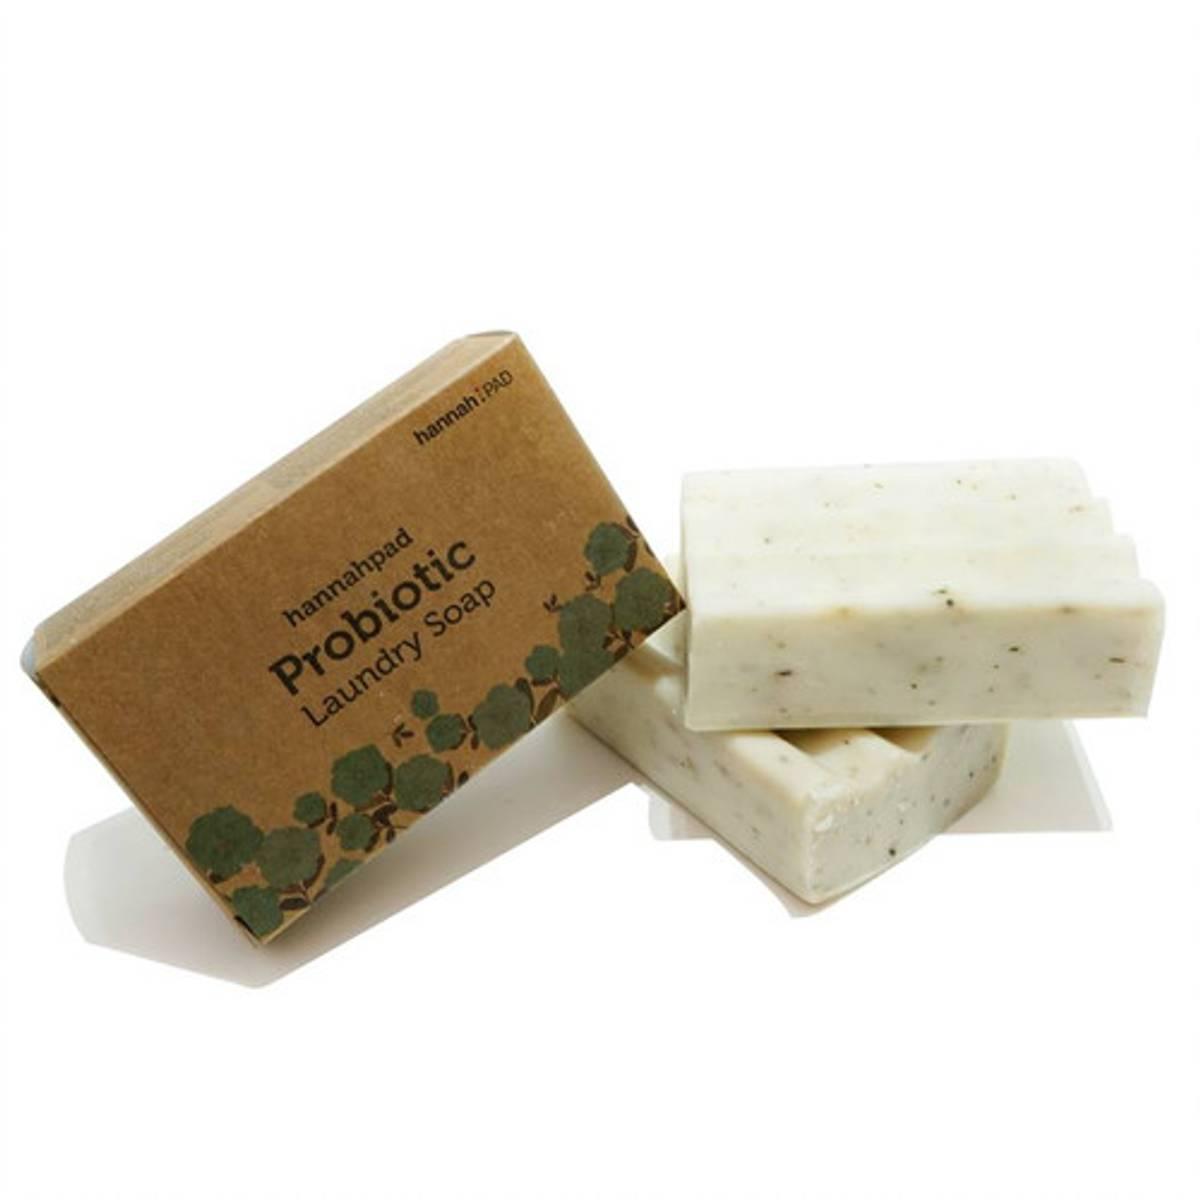 Probiotisk såpe ca 200g / Hannahpad